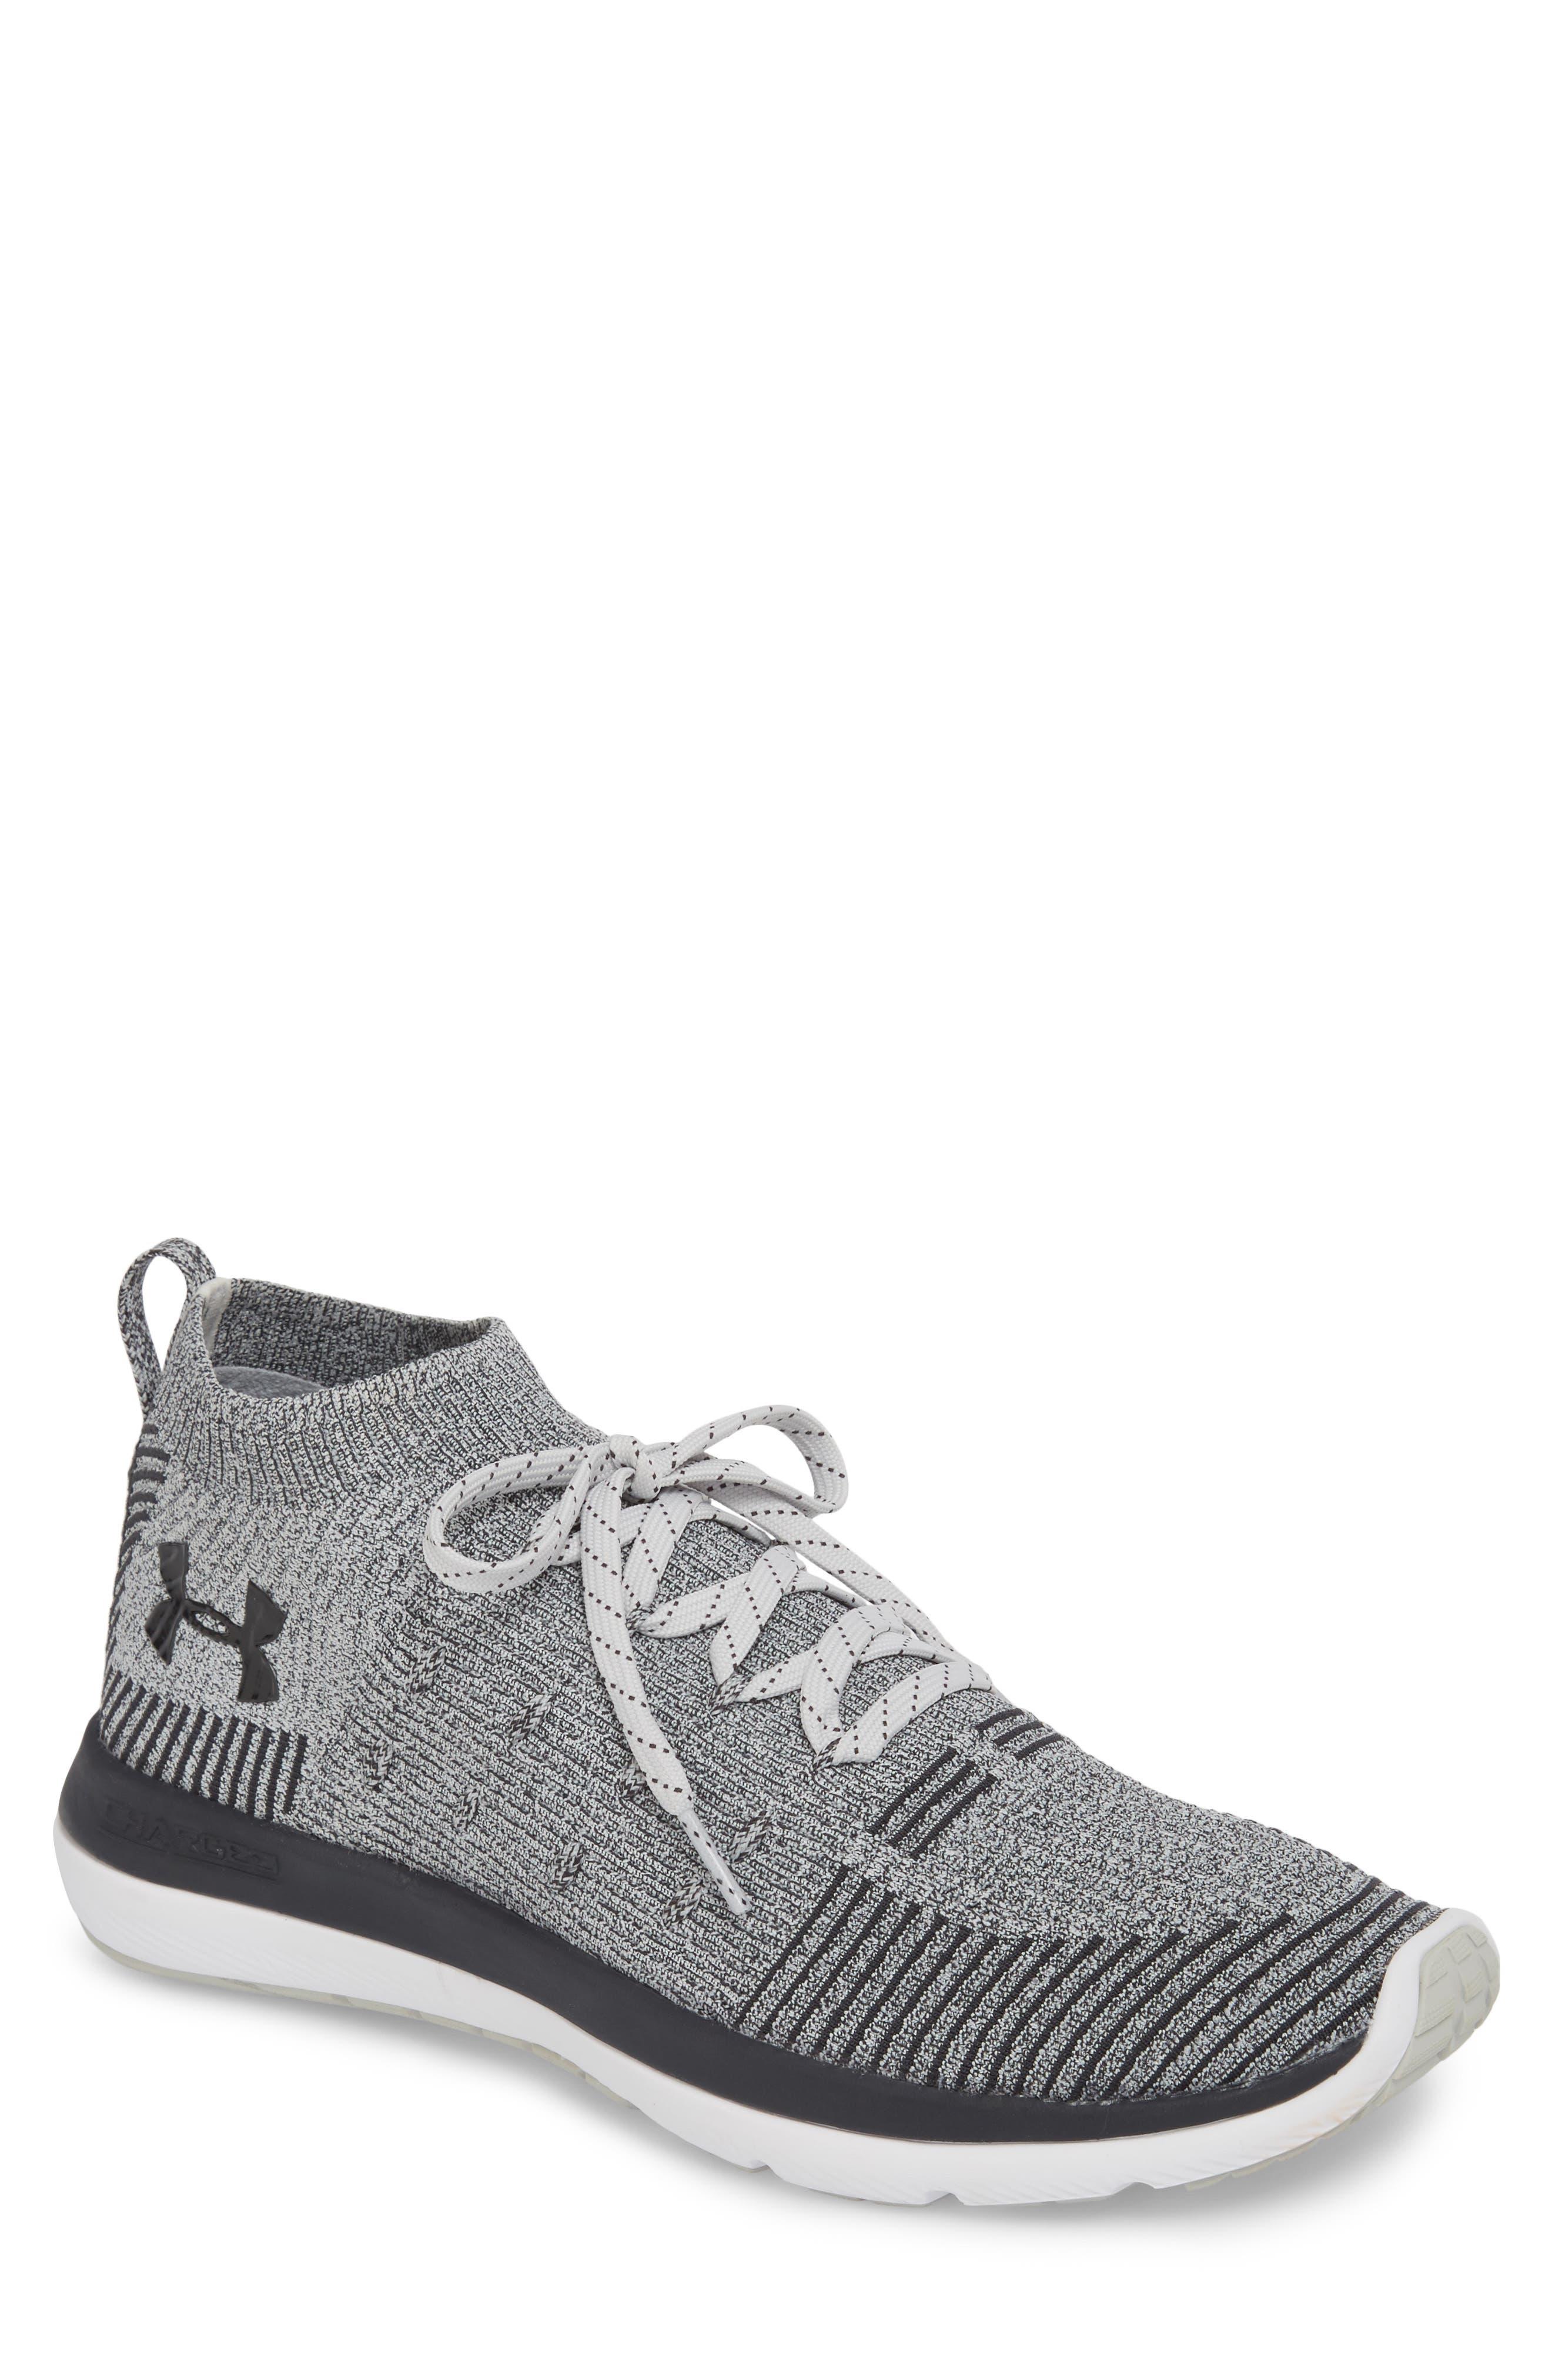 Slingflex Rise Sneaker,                         Main,                         color, ELEMENTAL/ ANTHRACITE